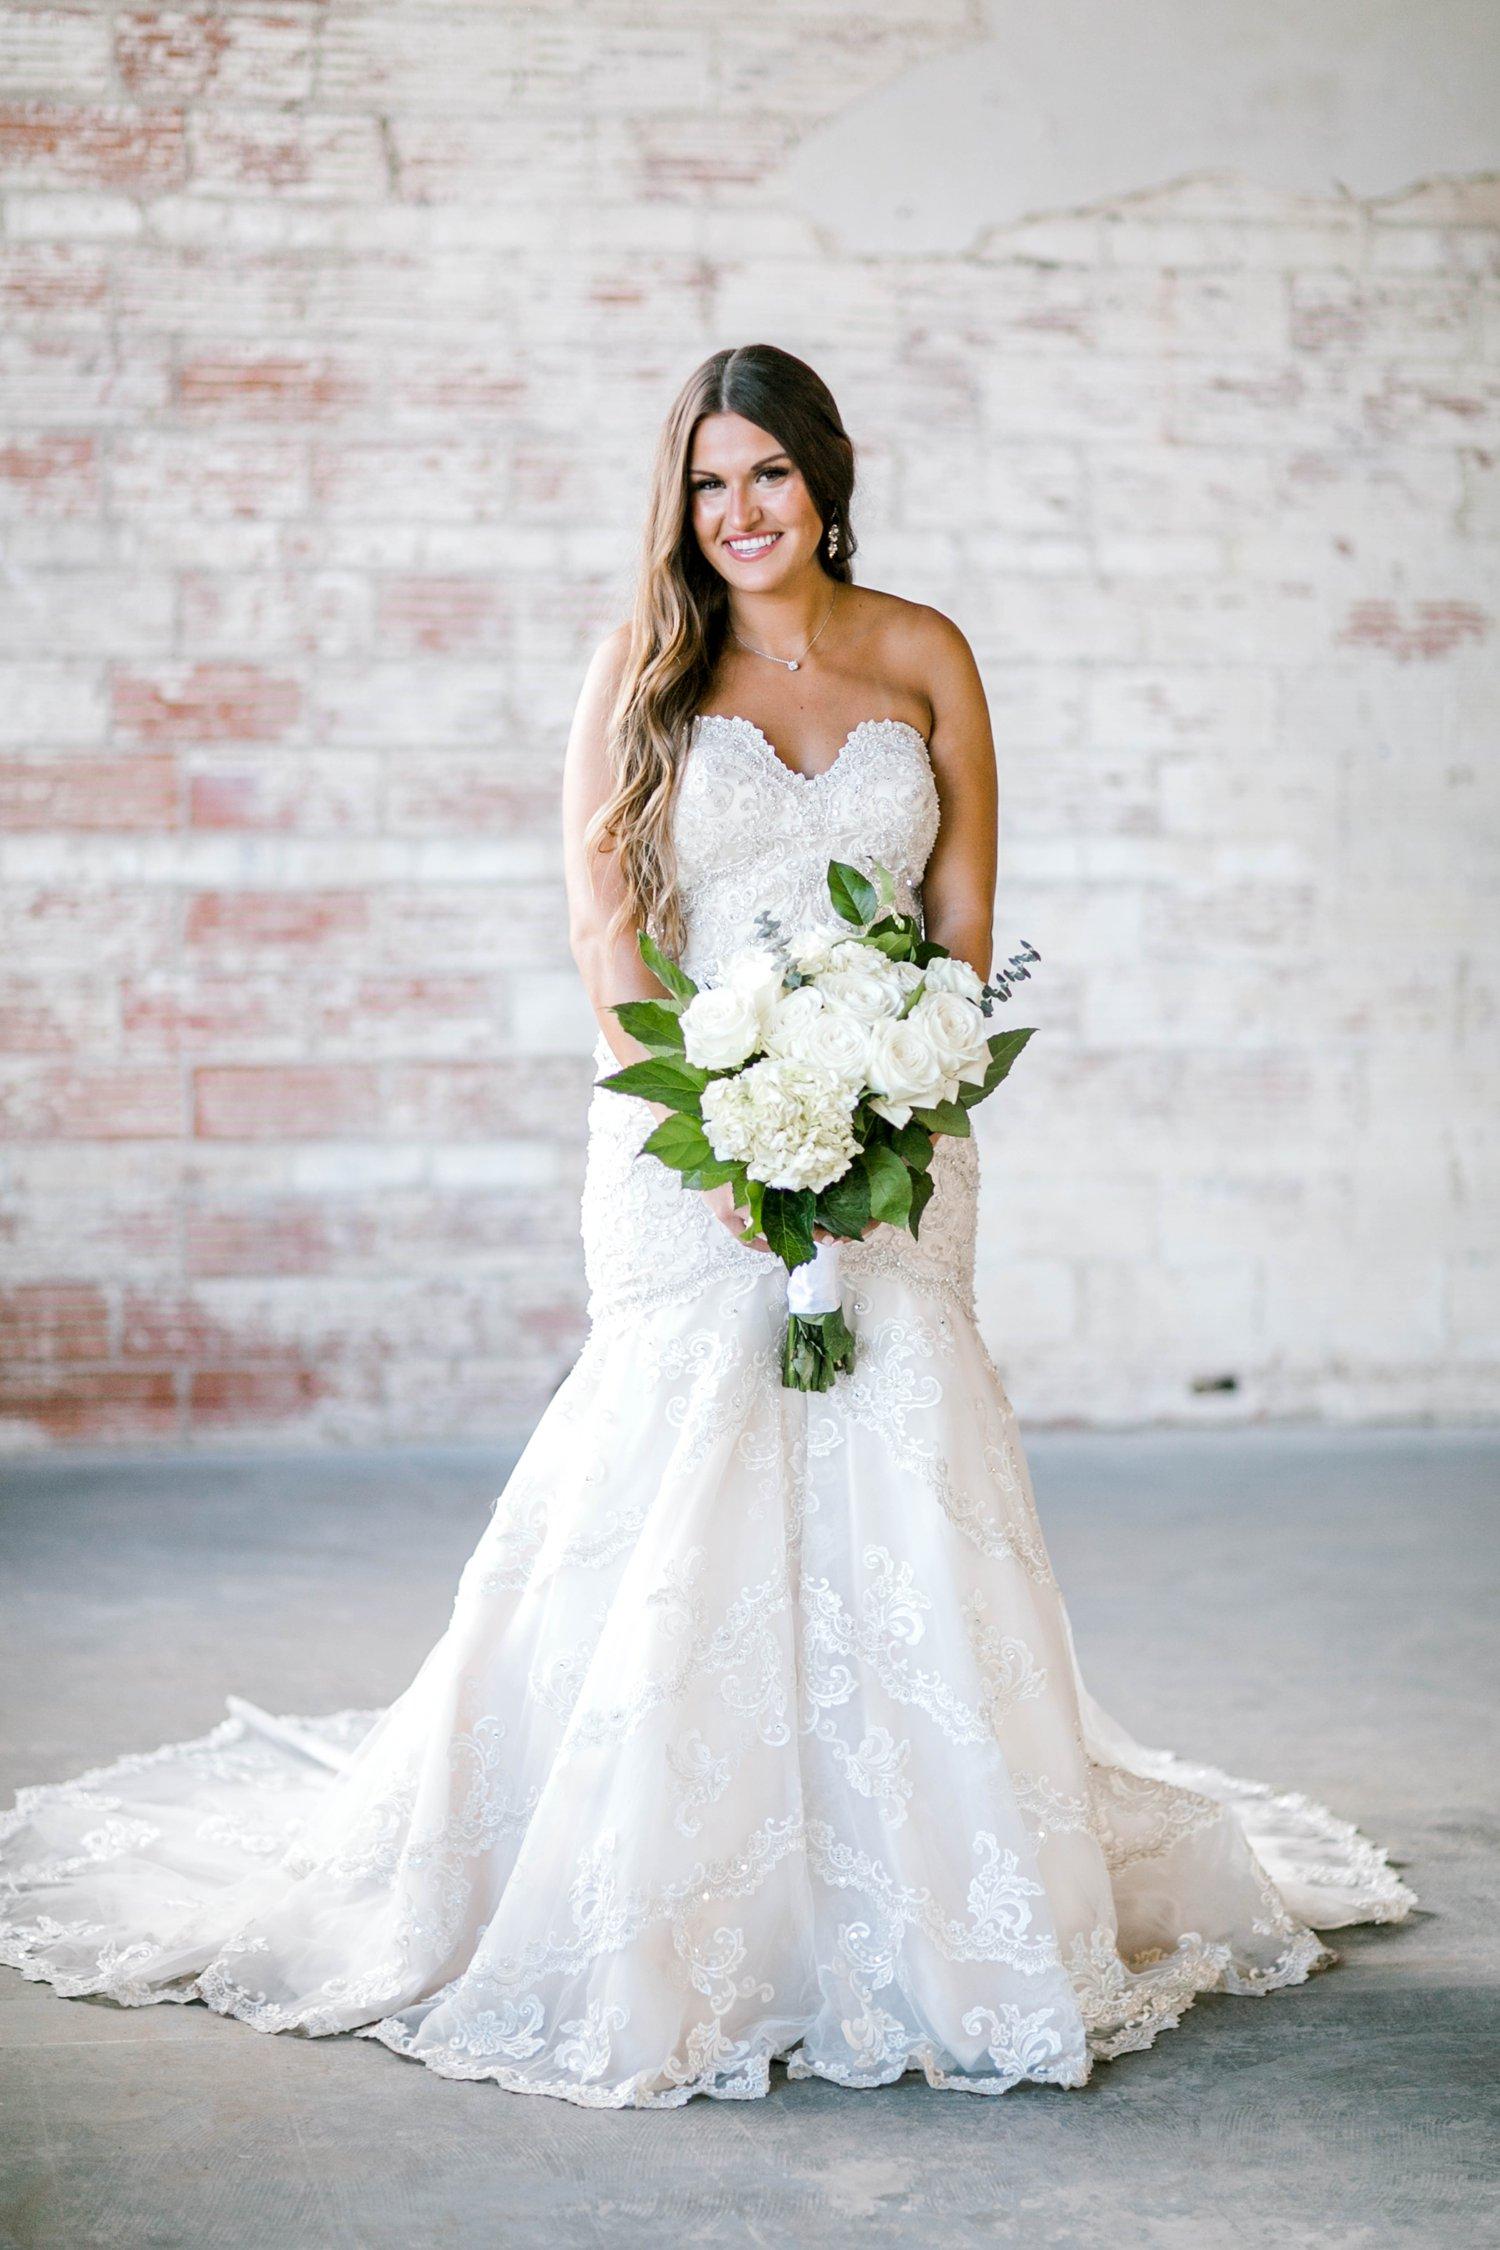 Kendra_Hill_Bridals_ALLEEJ_Lubbock_Wedding_Photographer_LHUCA_0001.jpg